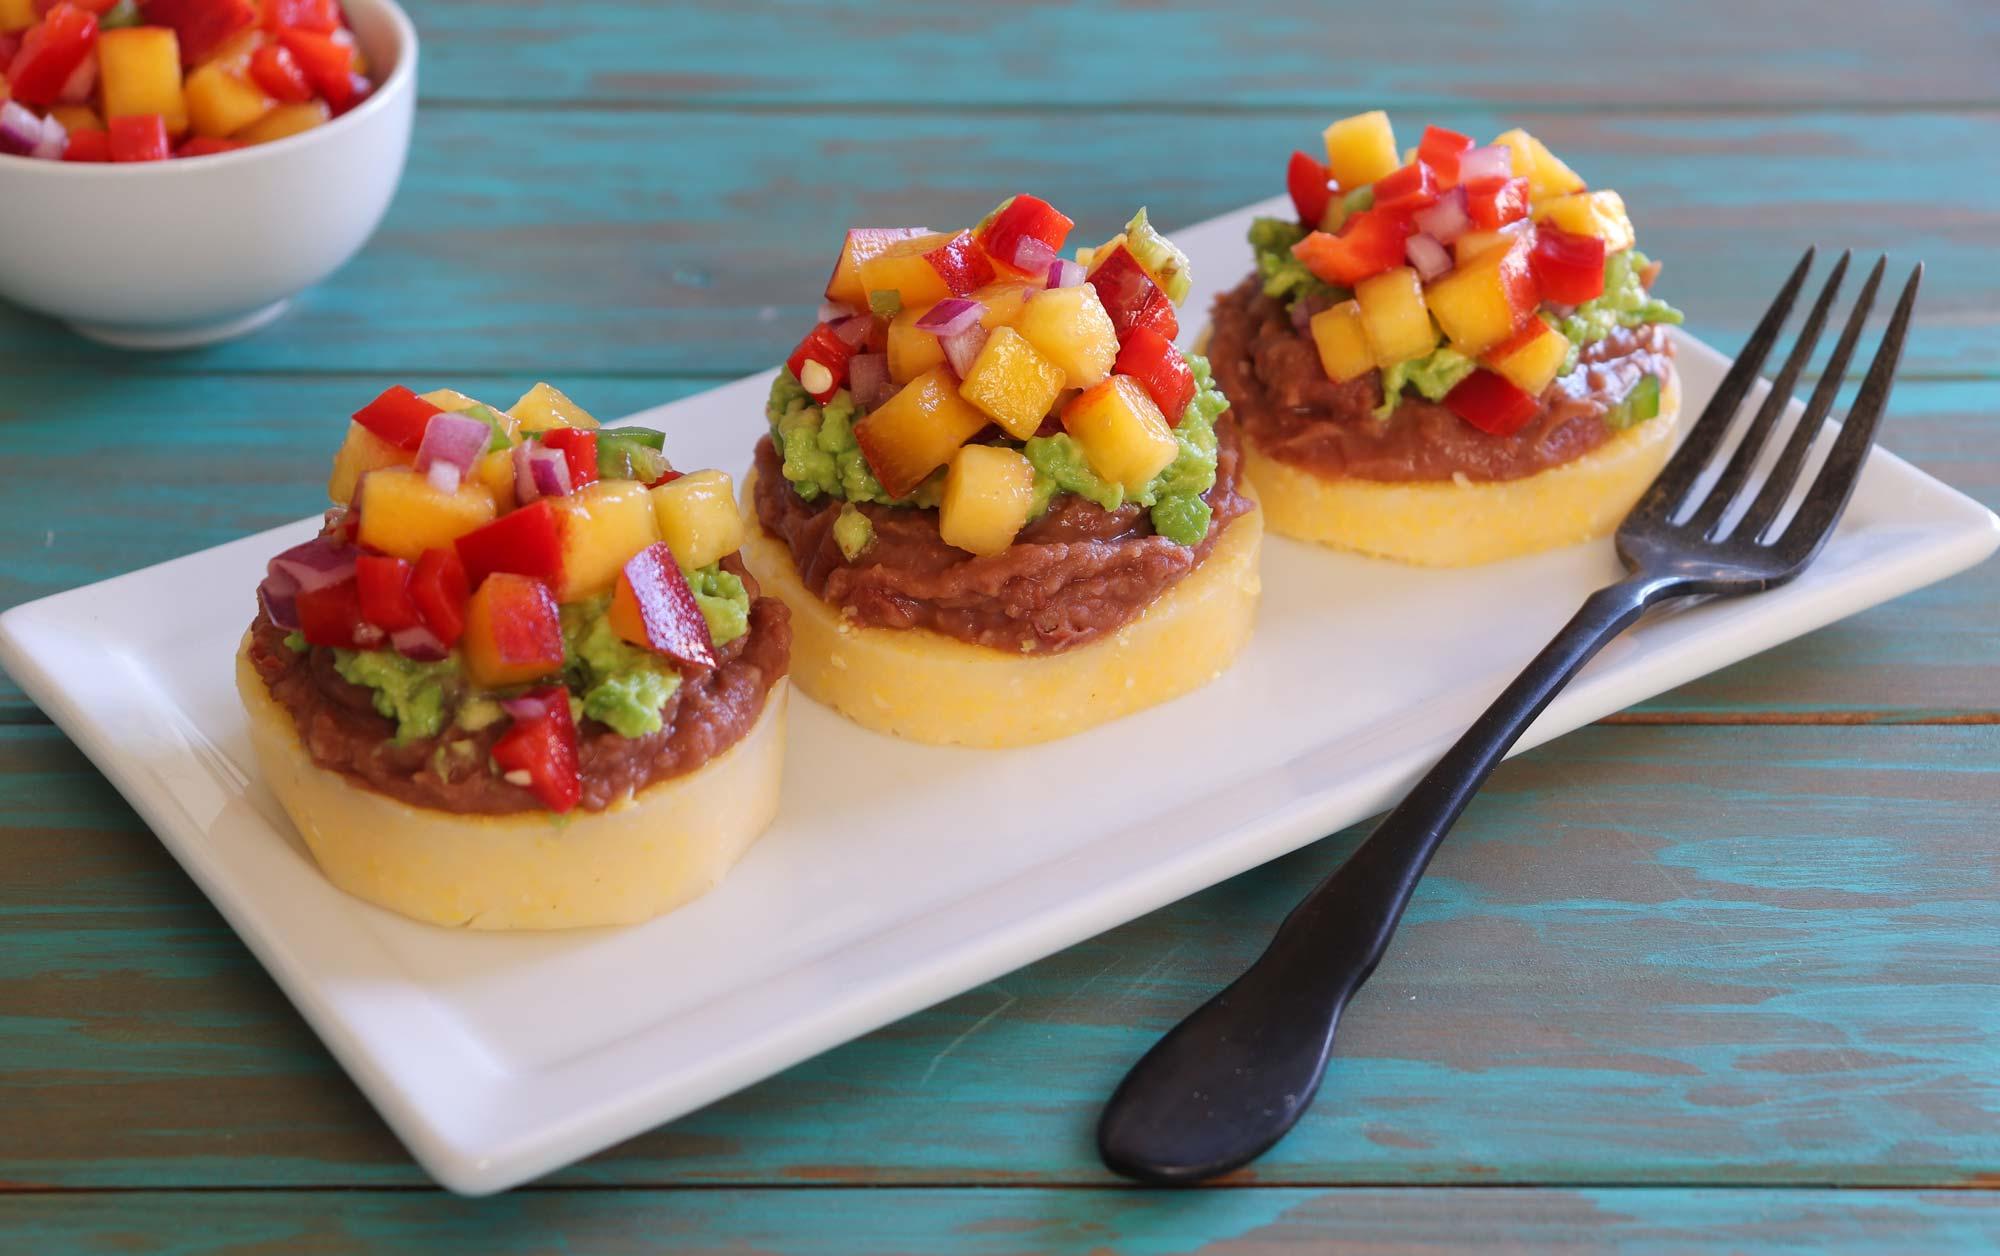 Healthy starters - Peachy polenta bites